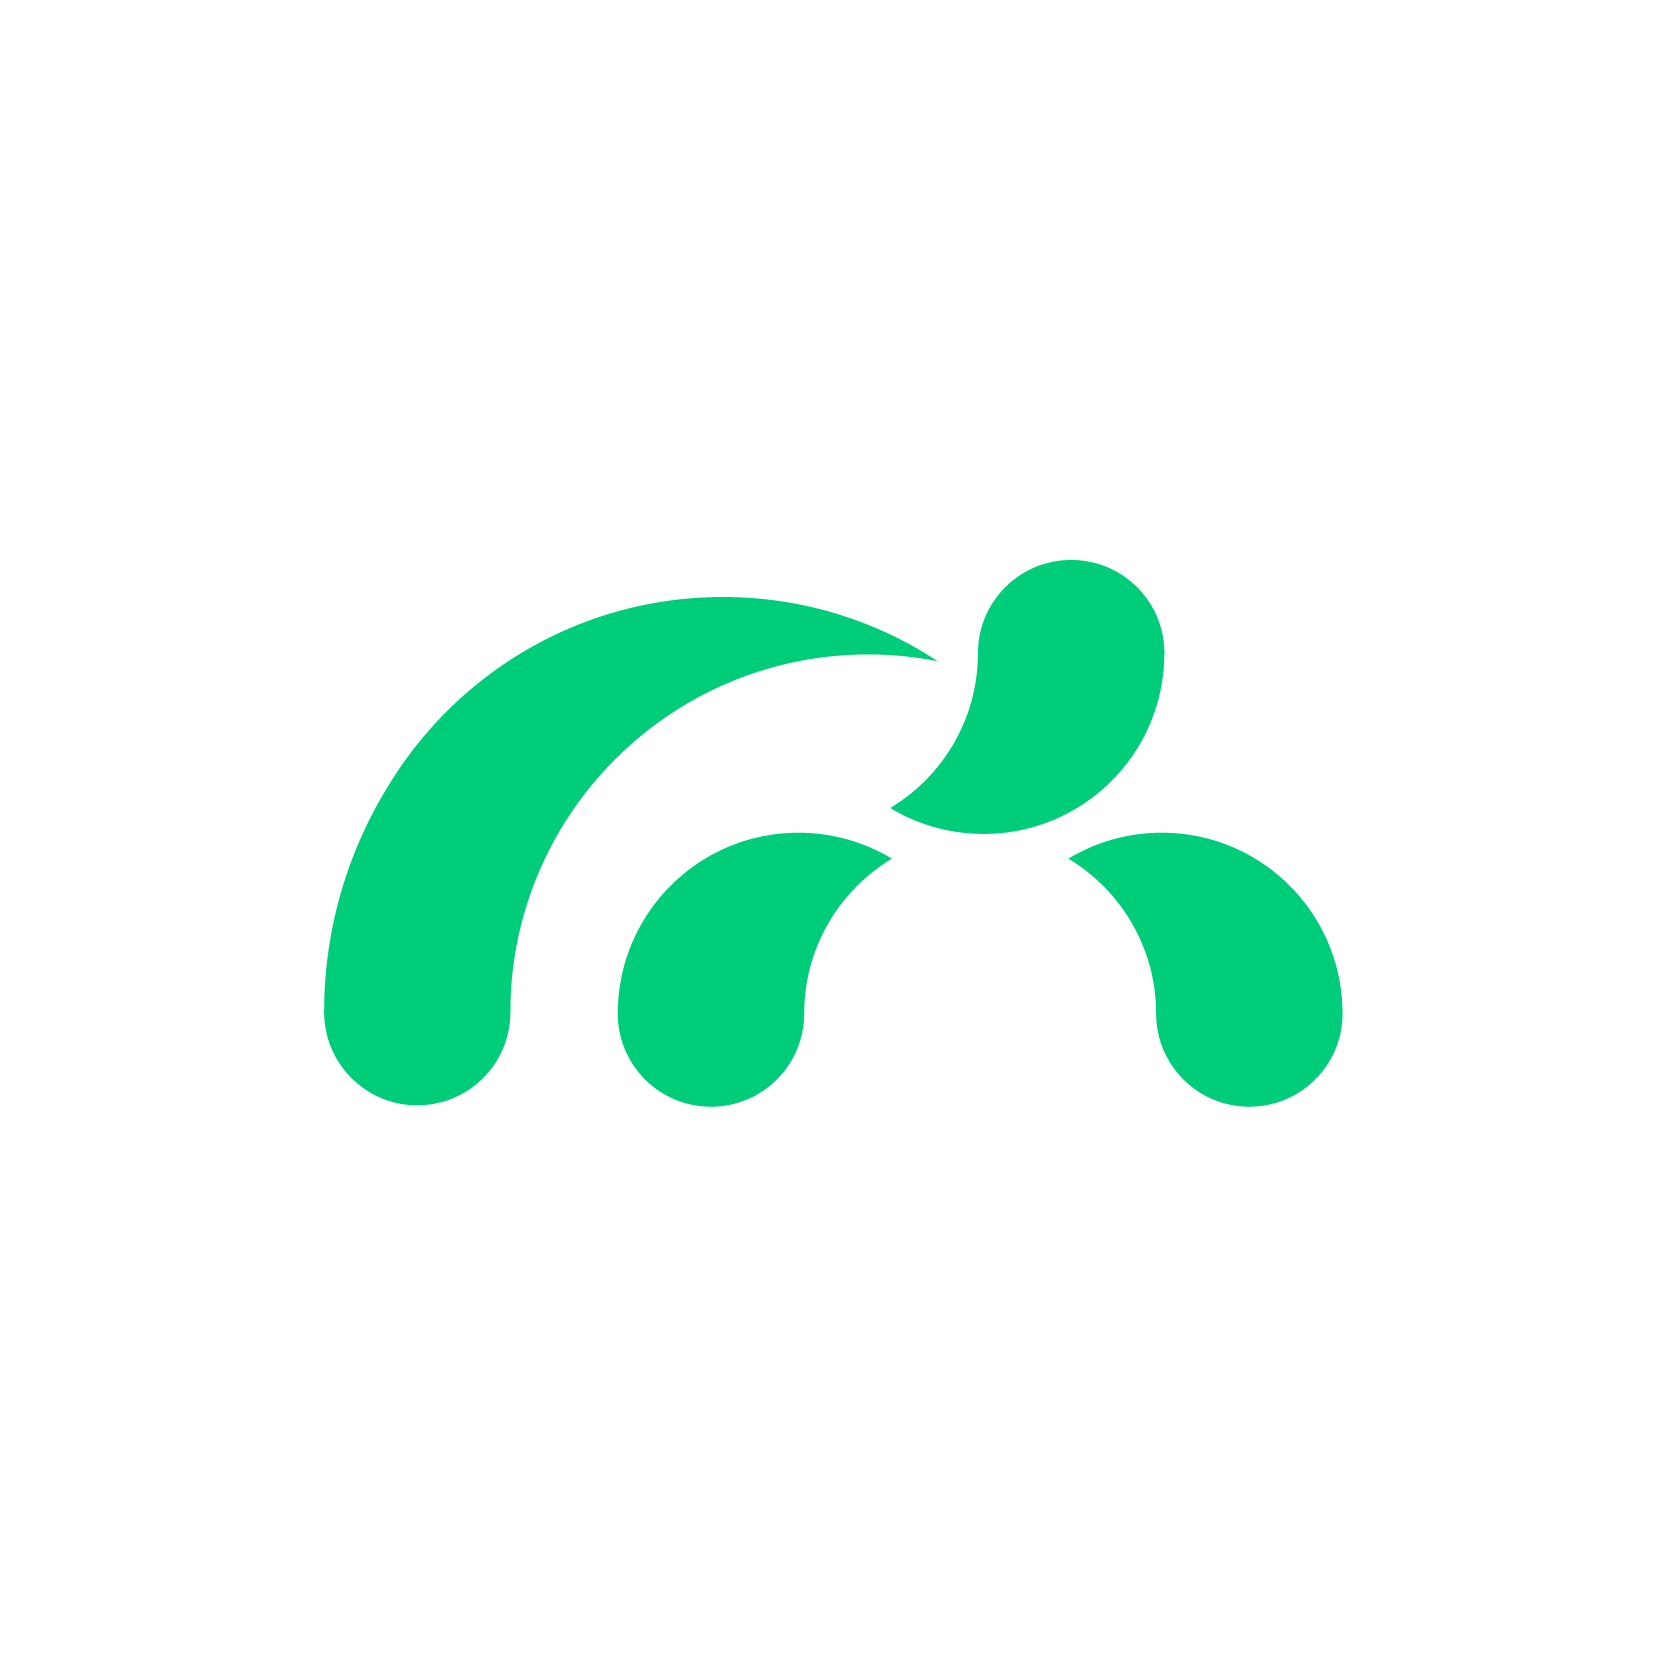 Odnomiar_logo_turtle